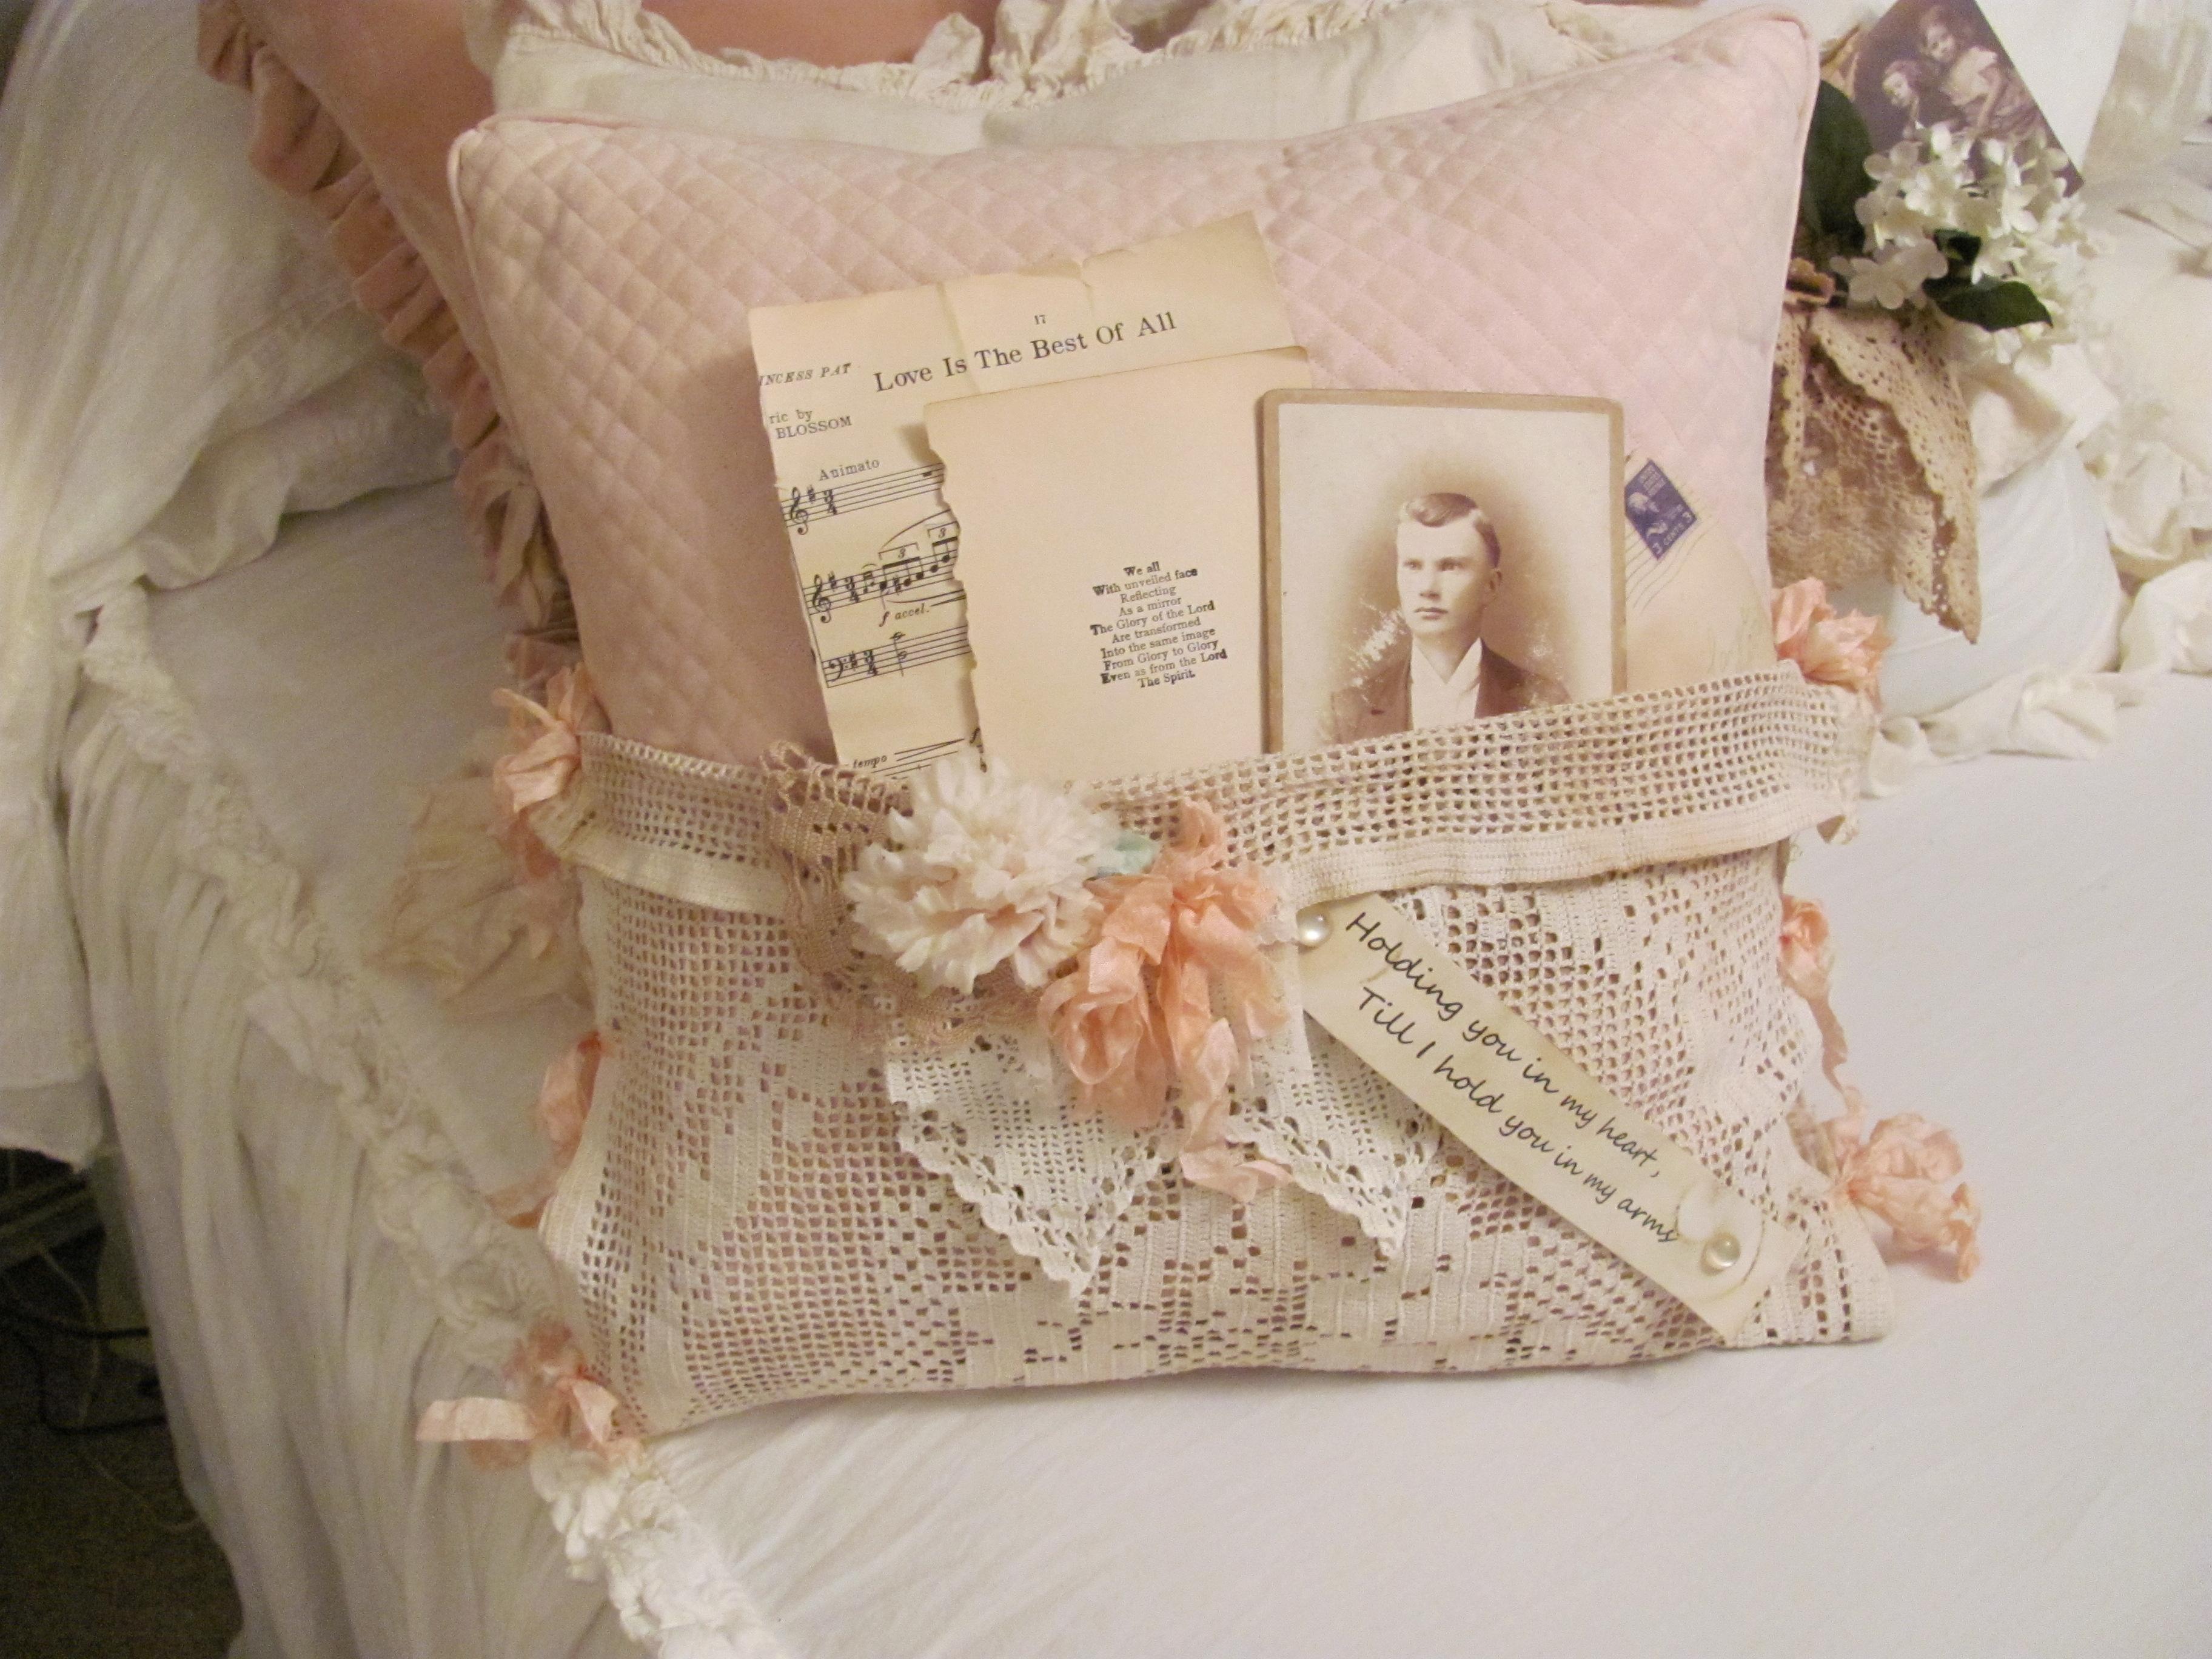 Baggrunde : hvid, seng, musik, årgang, pude, lyserød, blonder ...